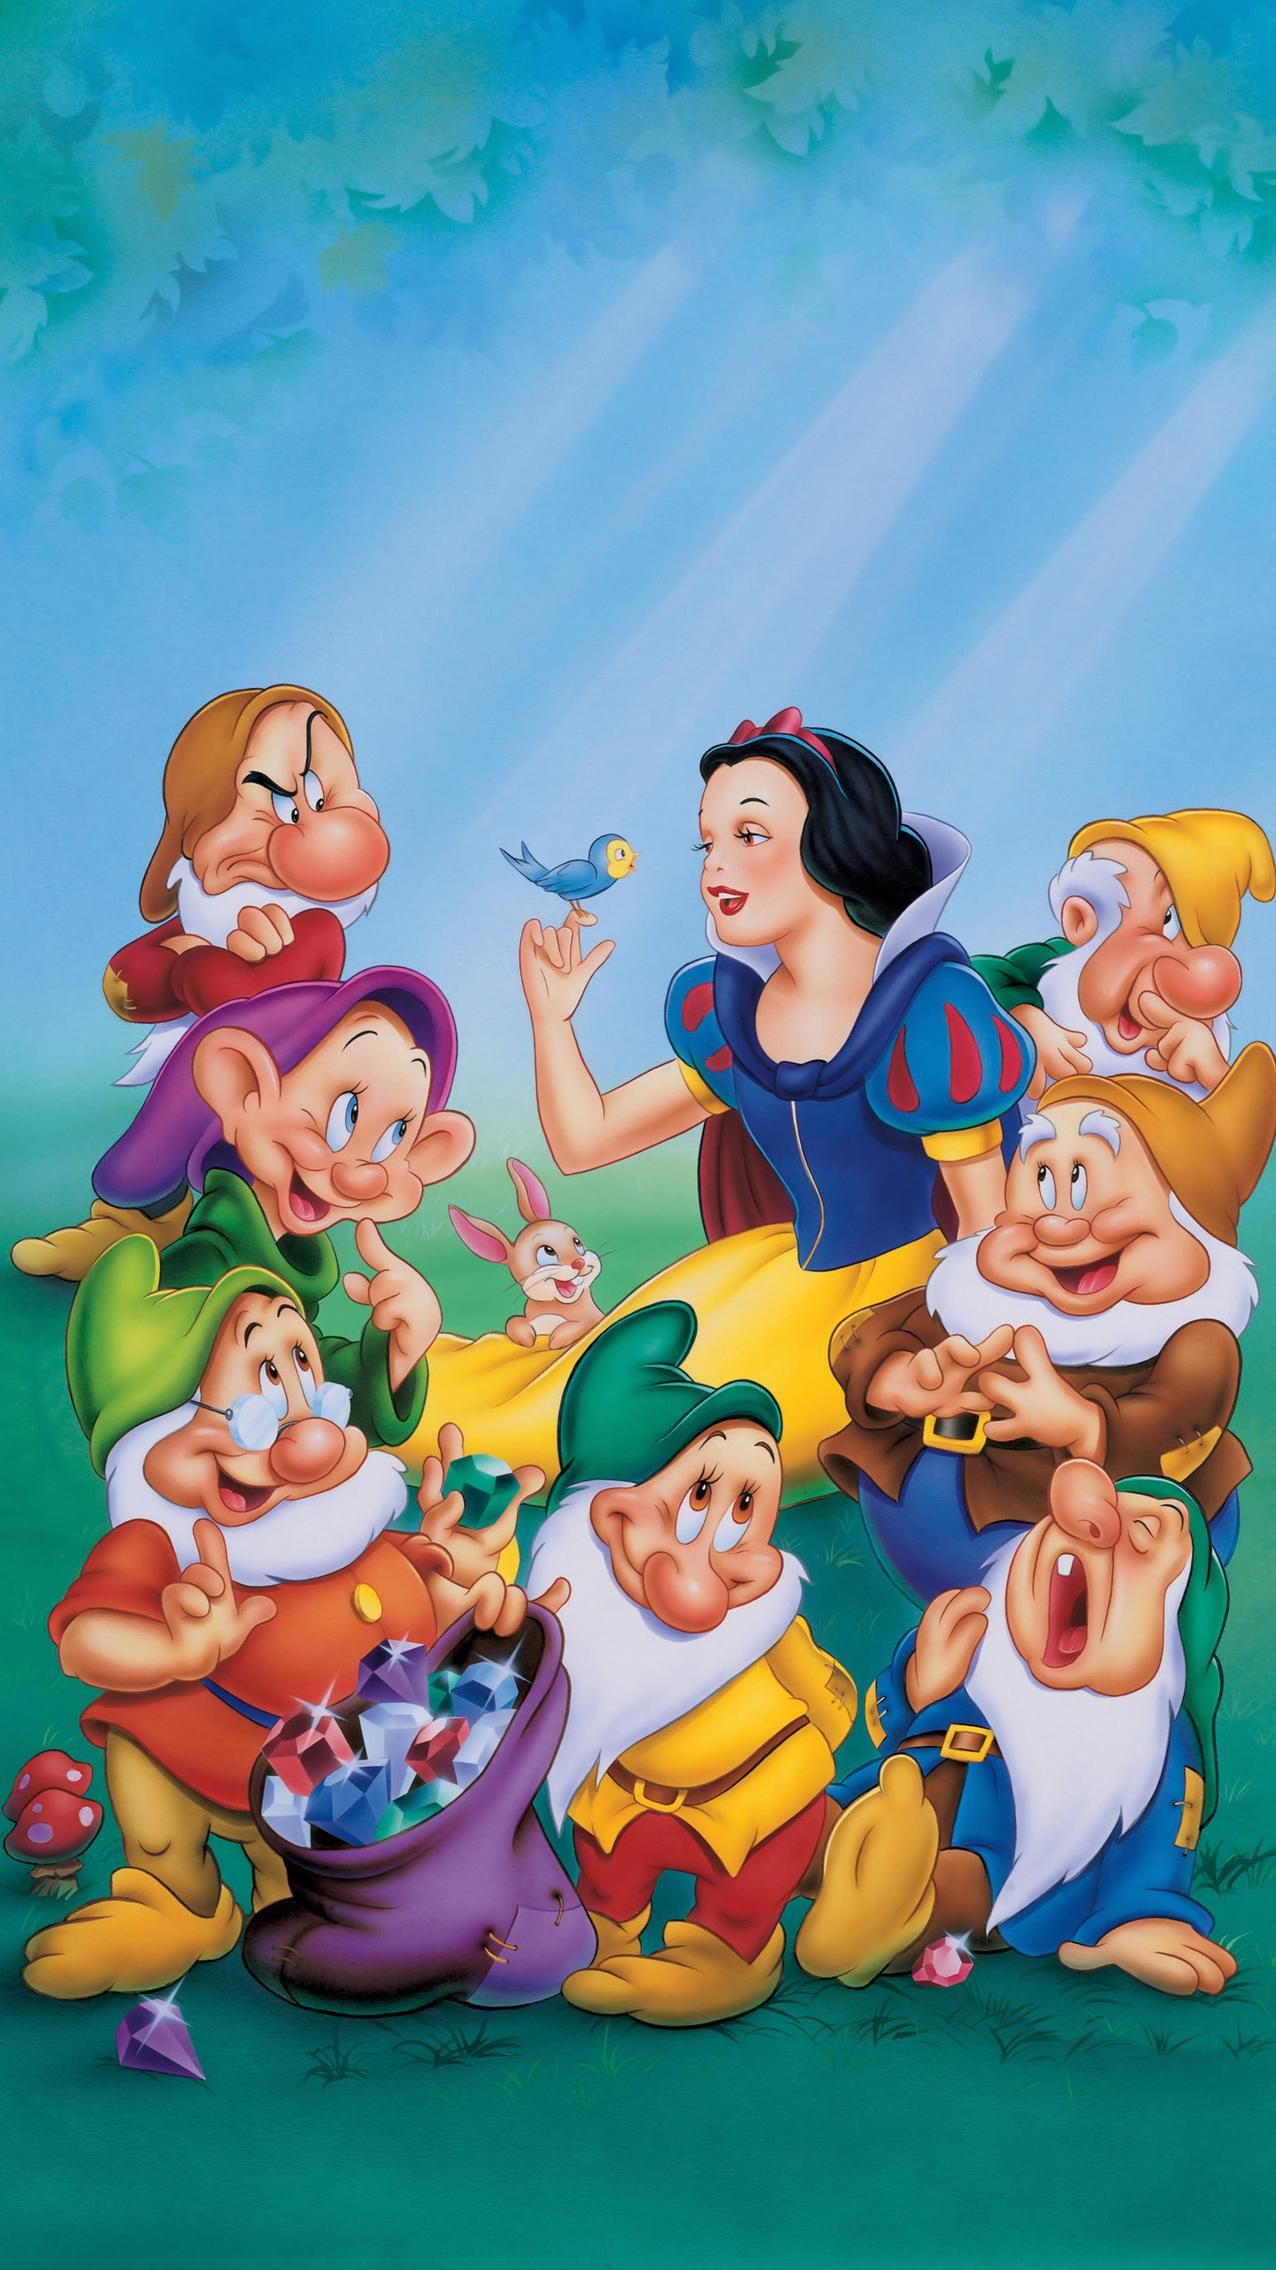 Snow White And The Seven Dwarfs 1937 Phone Wallpaper Moviemania Disney Princess Snow White Disney Movie Characters Disney Wallpaper